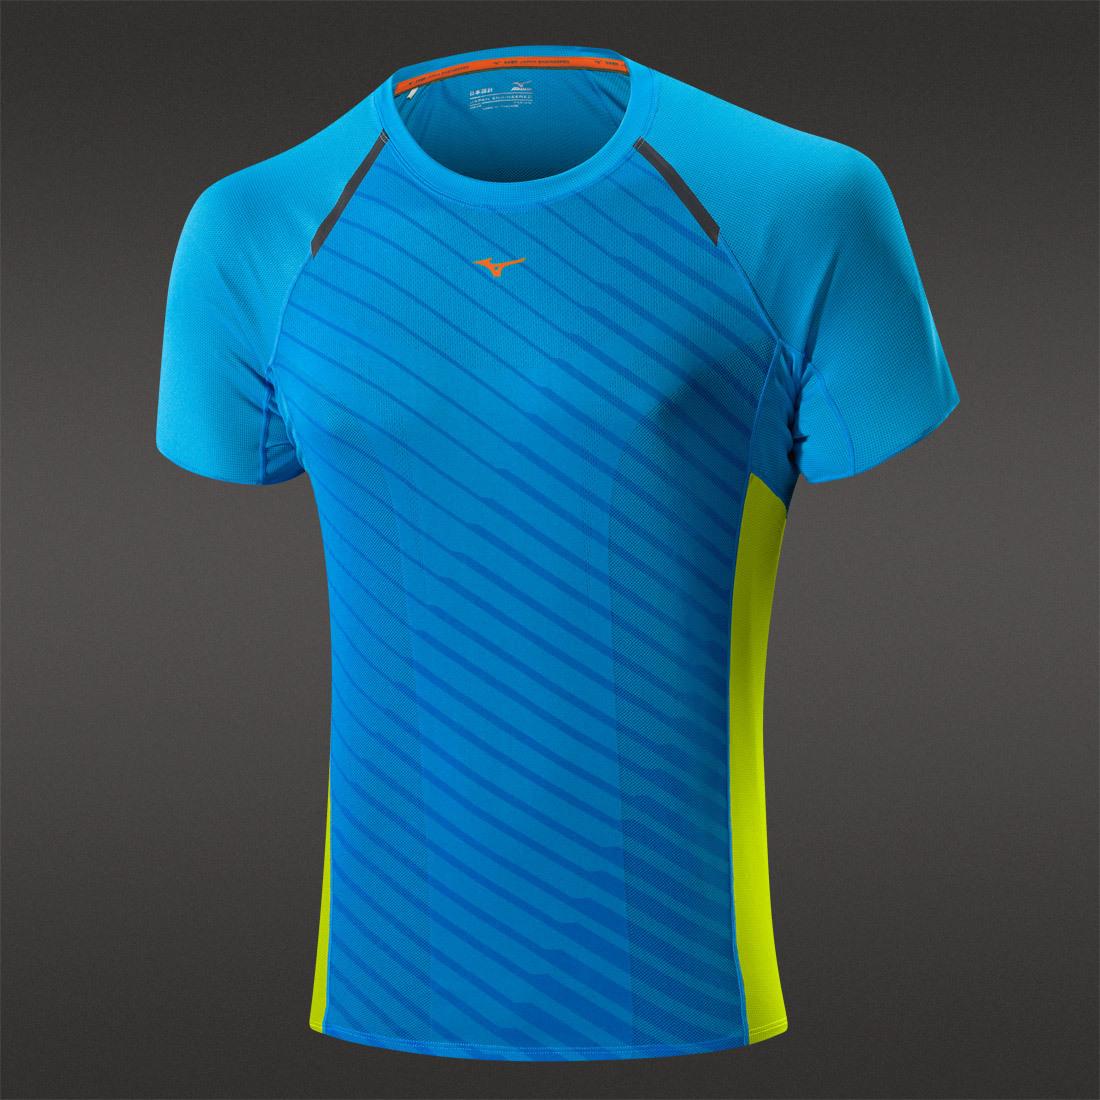 Мужская беговая футболка Mizuno Drylite Premium Tee (J2GA5003 22)